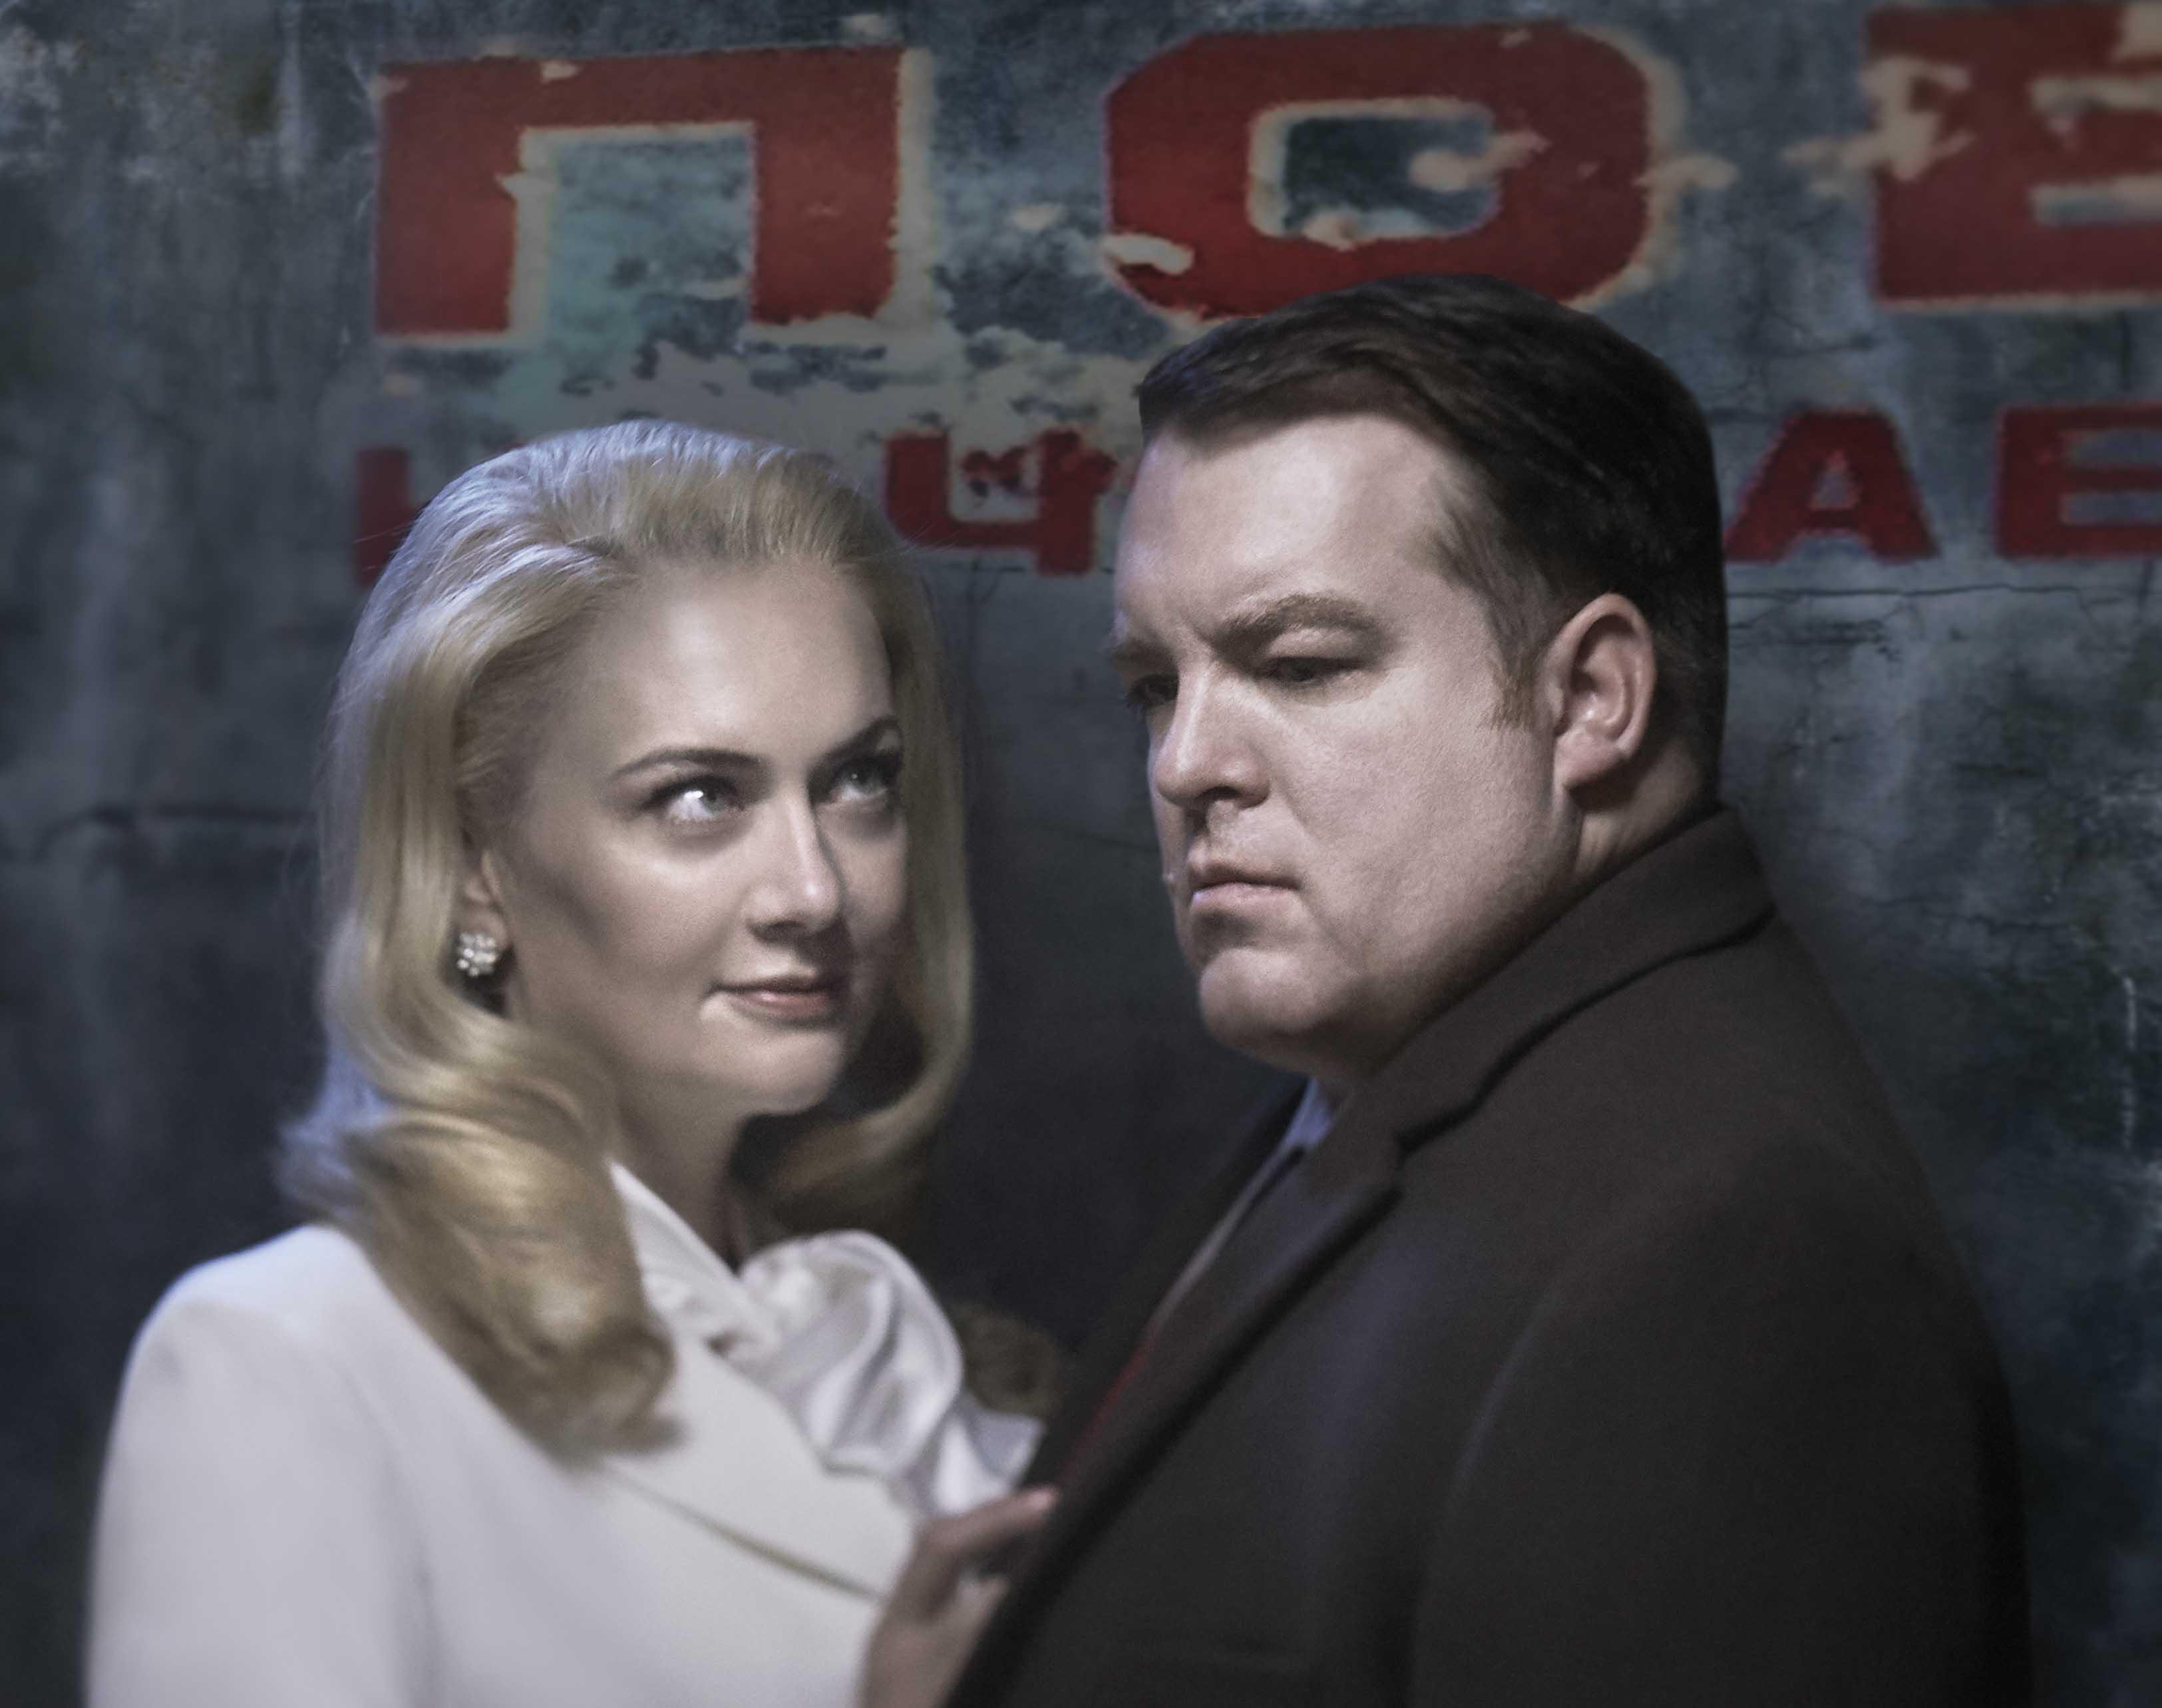 [Dimitrij] Marina and Dimitrij, Todd Norwood